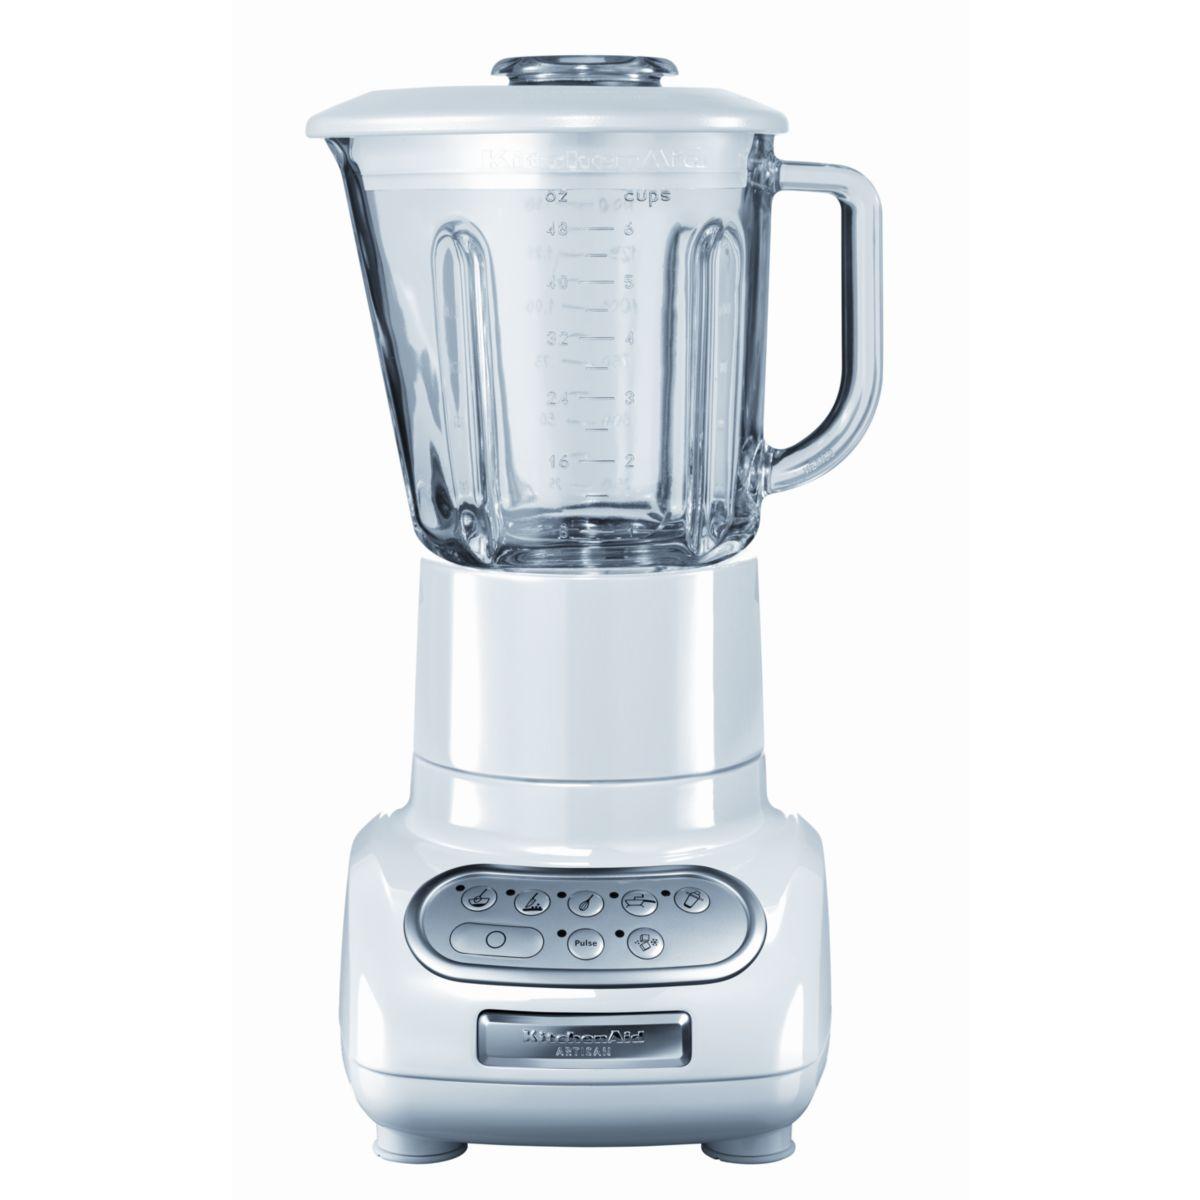 Blender kitchenaid artisan® 5ksb5553 ewh blanc - produit coup de coeur webdistrib.com !